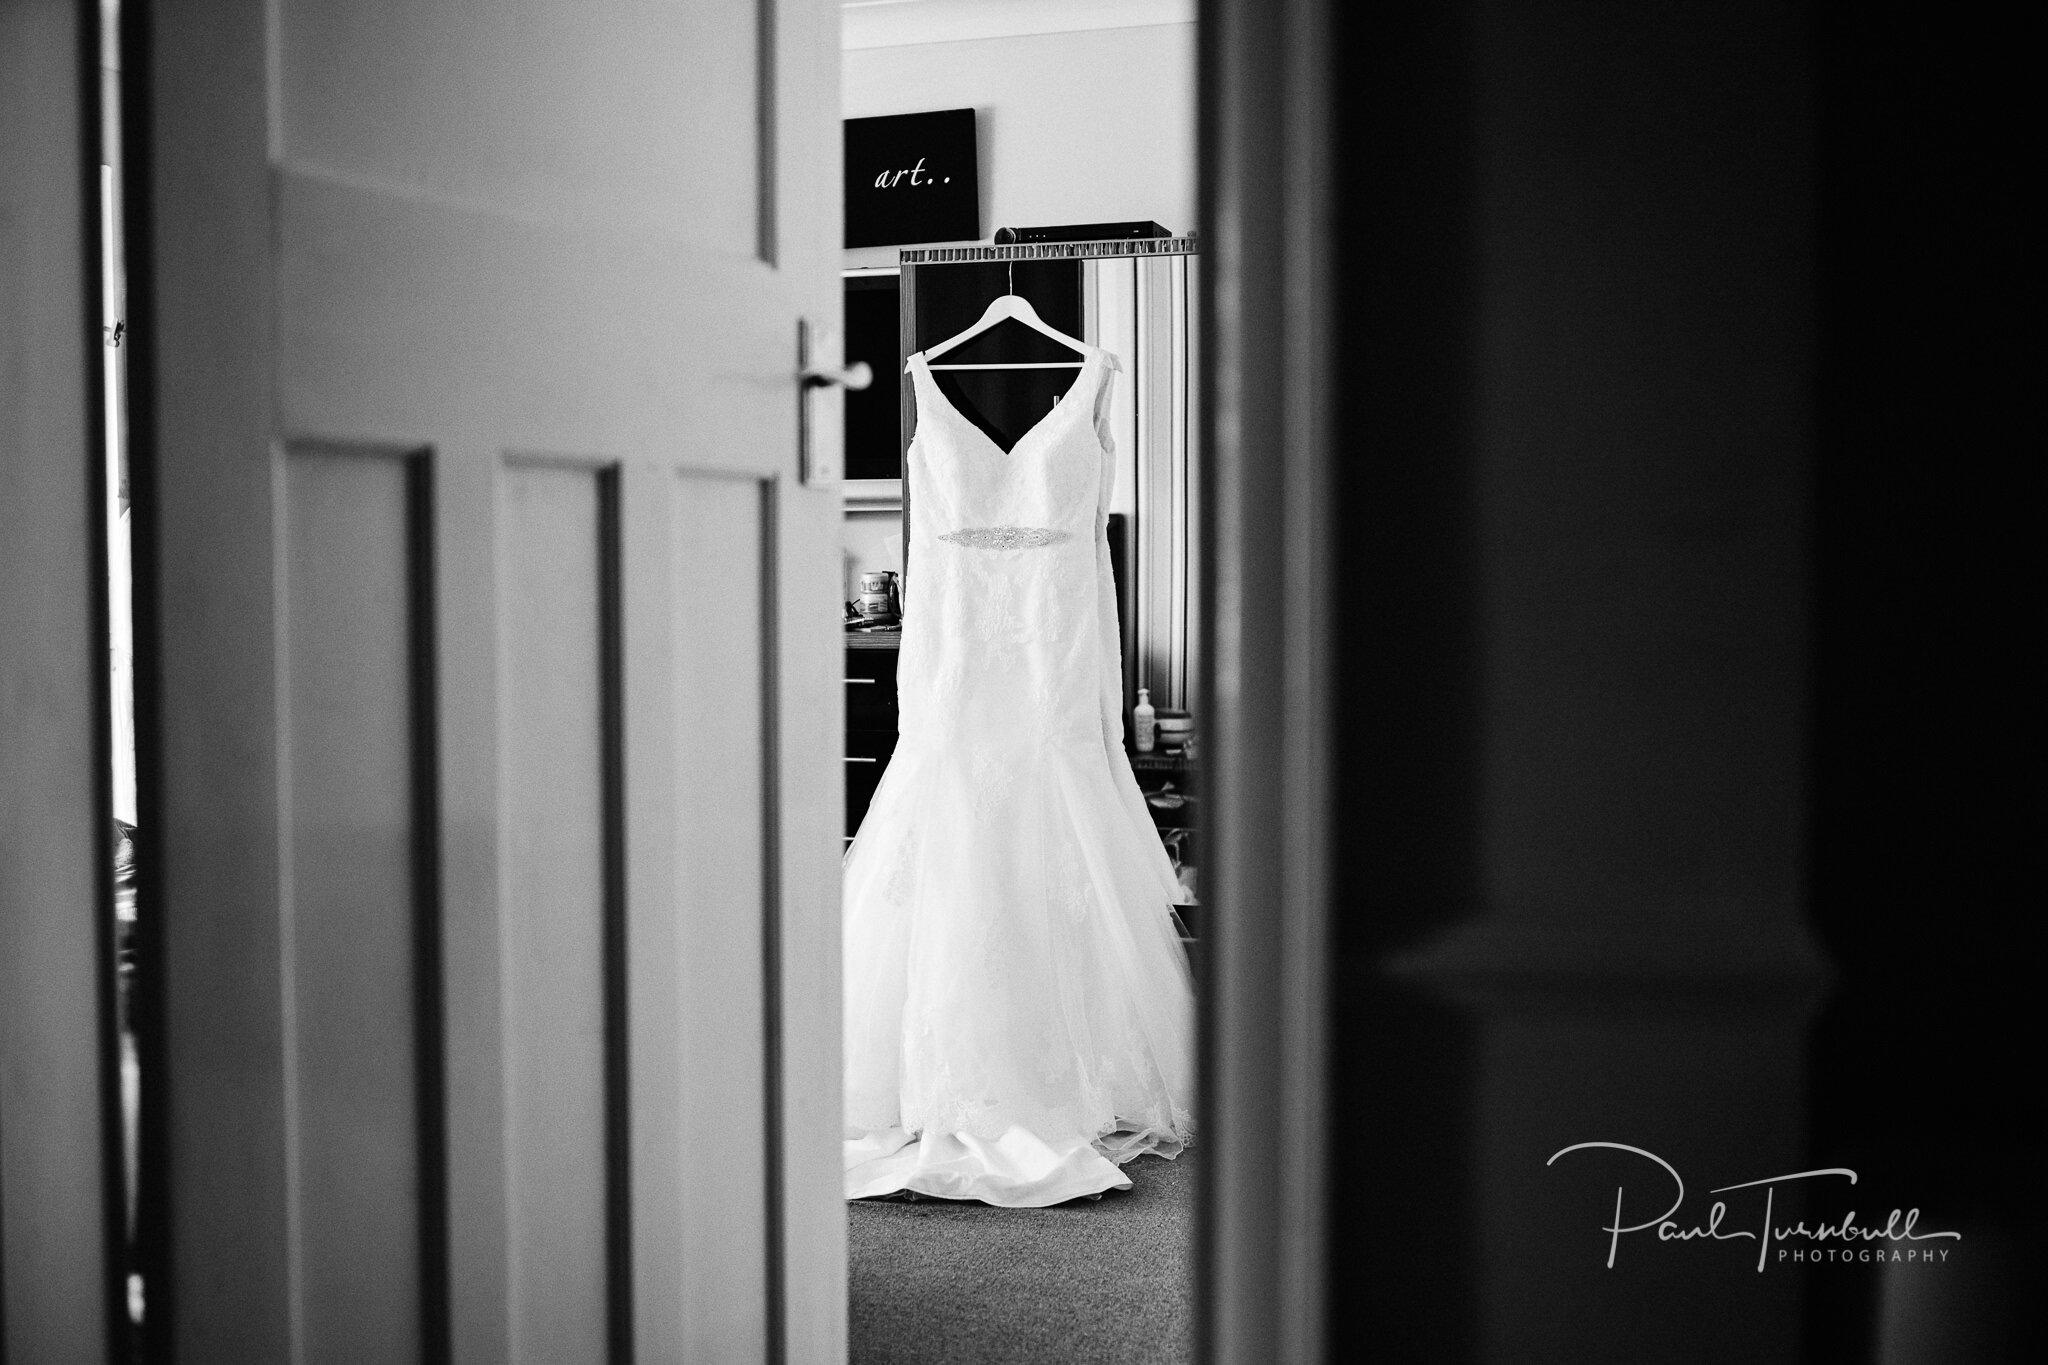 Wedding dress on hanger in bedroom. Wedding Photographer Hull